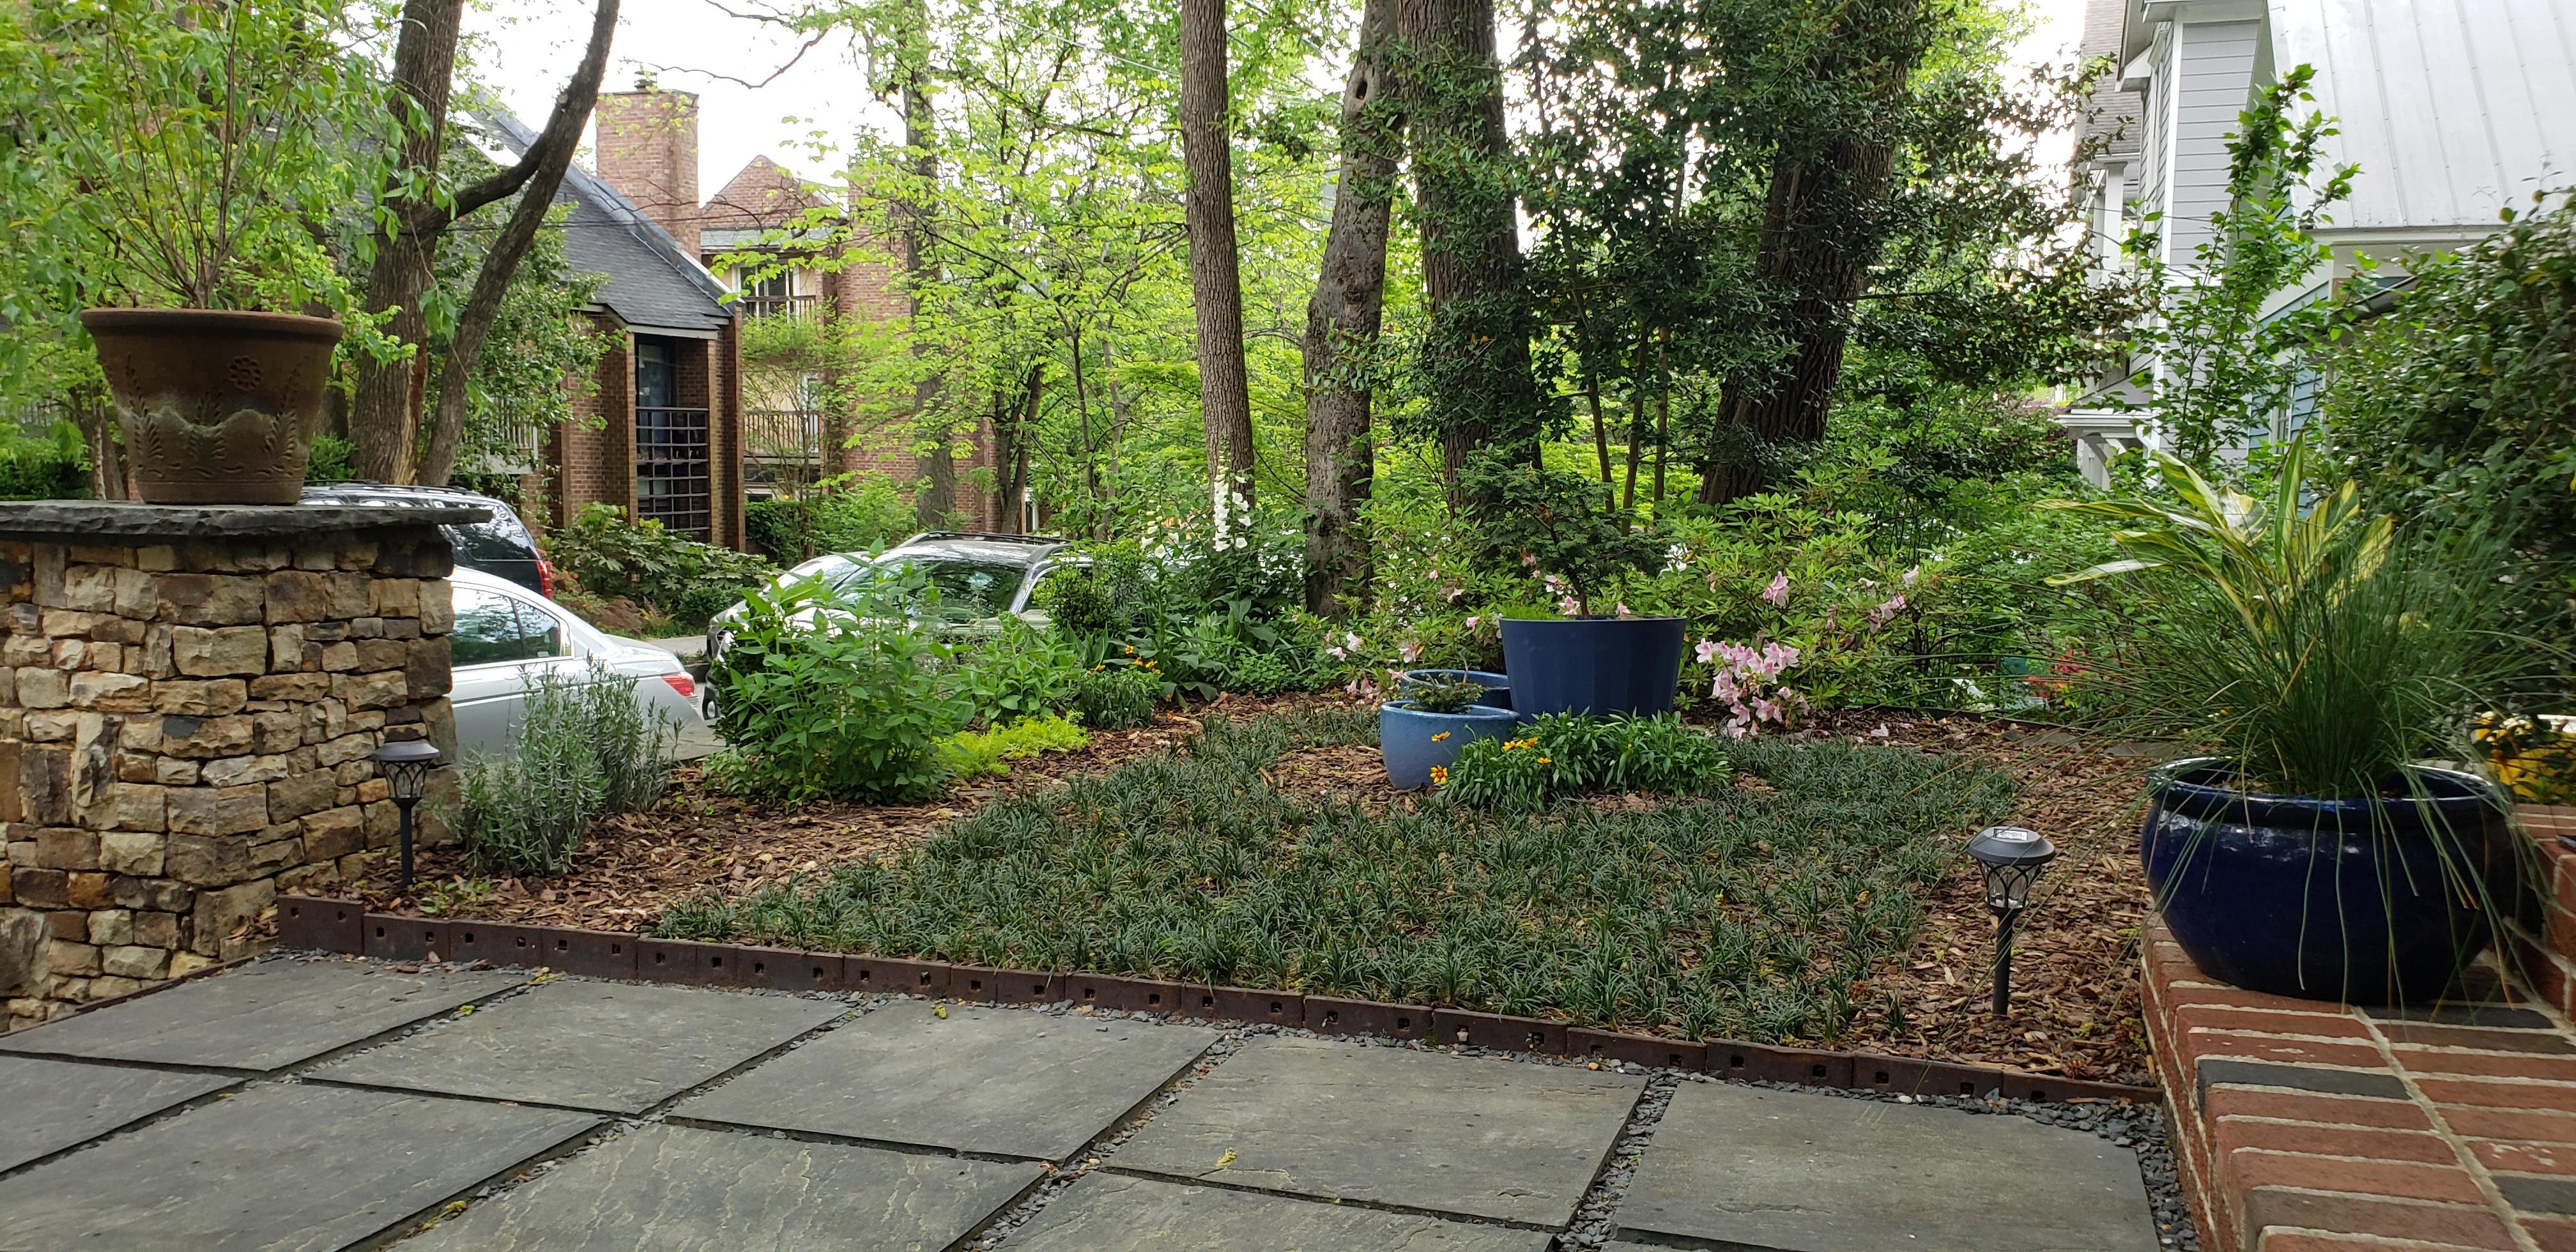 17 - spring perennials emerged